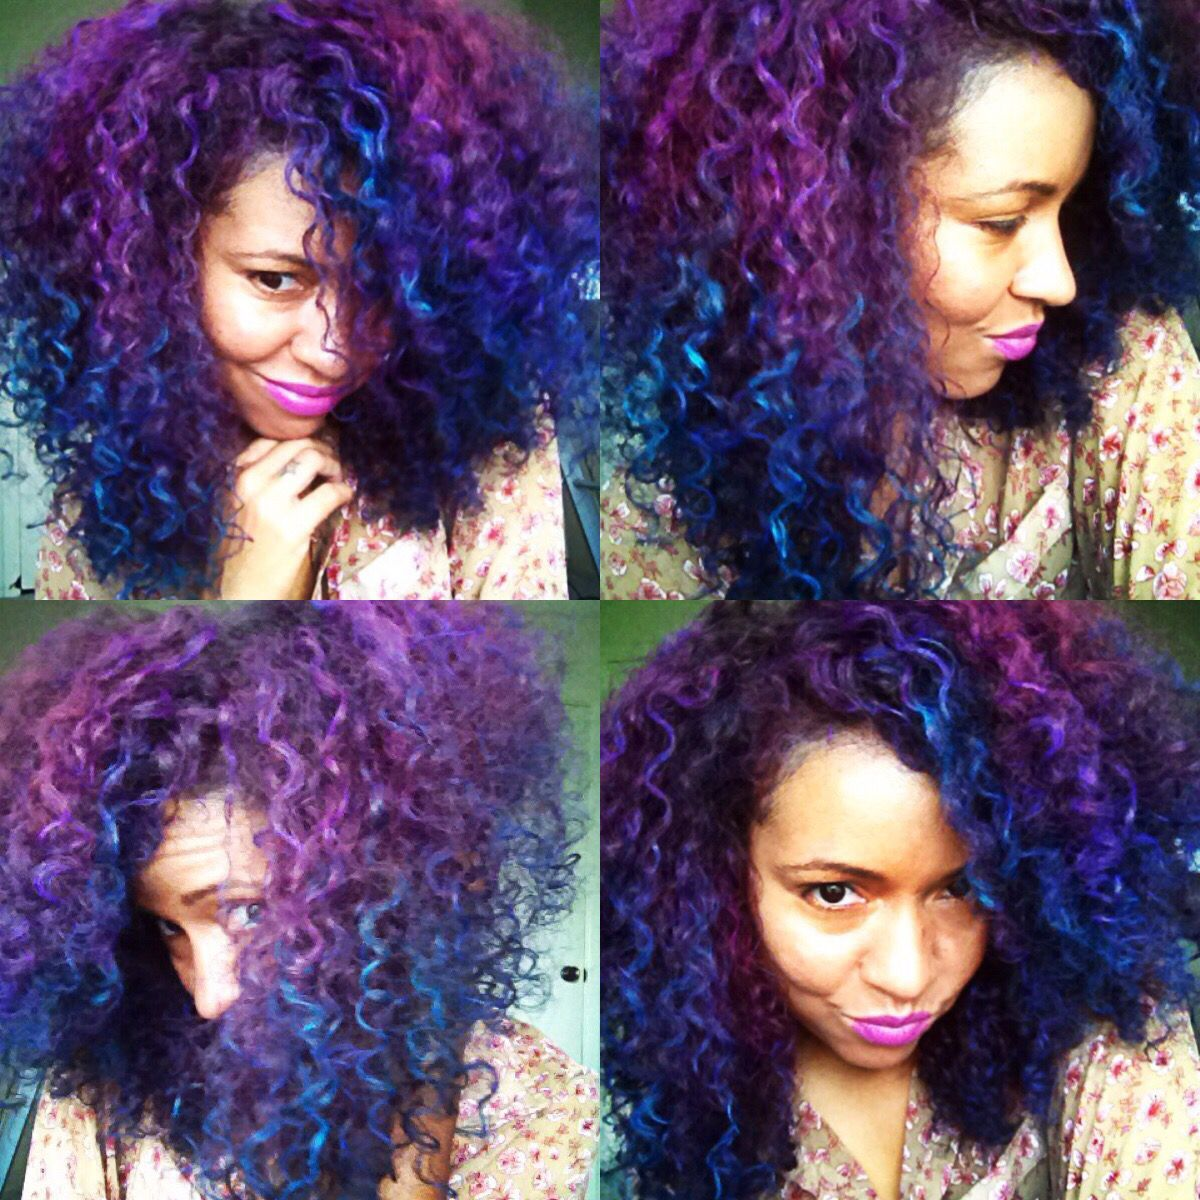 Pin By Lexy Mckoy On Mixed Girls Dyed Hair Hair Dye Tutorial Splat Hair Dye Natural Hair Styles